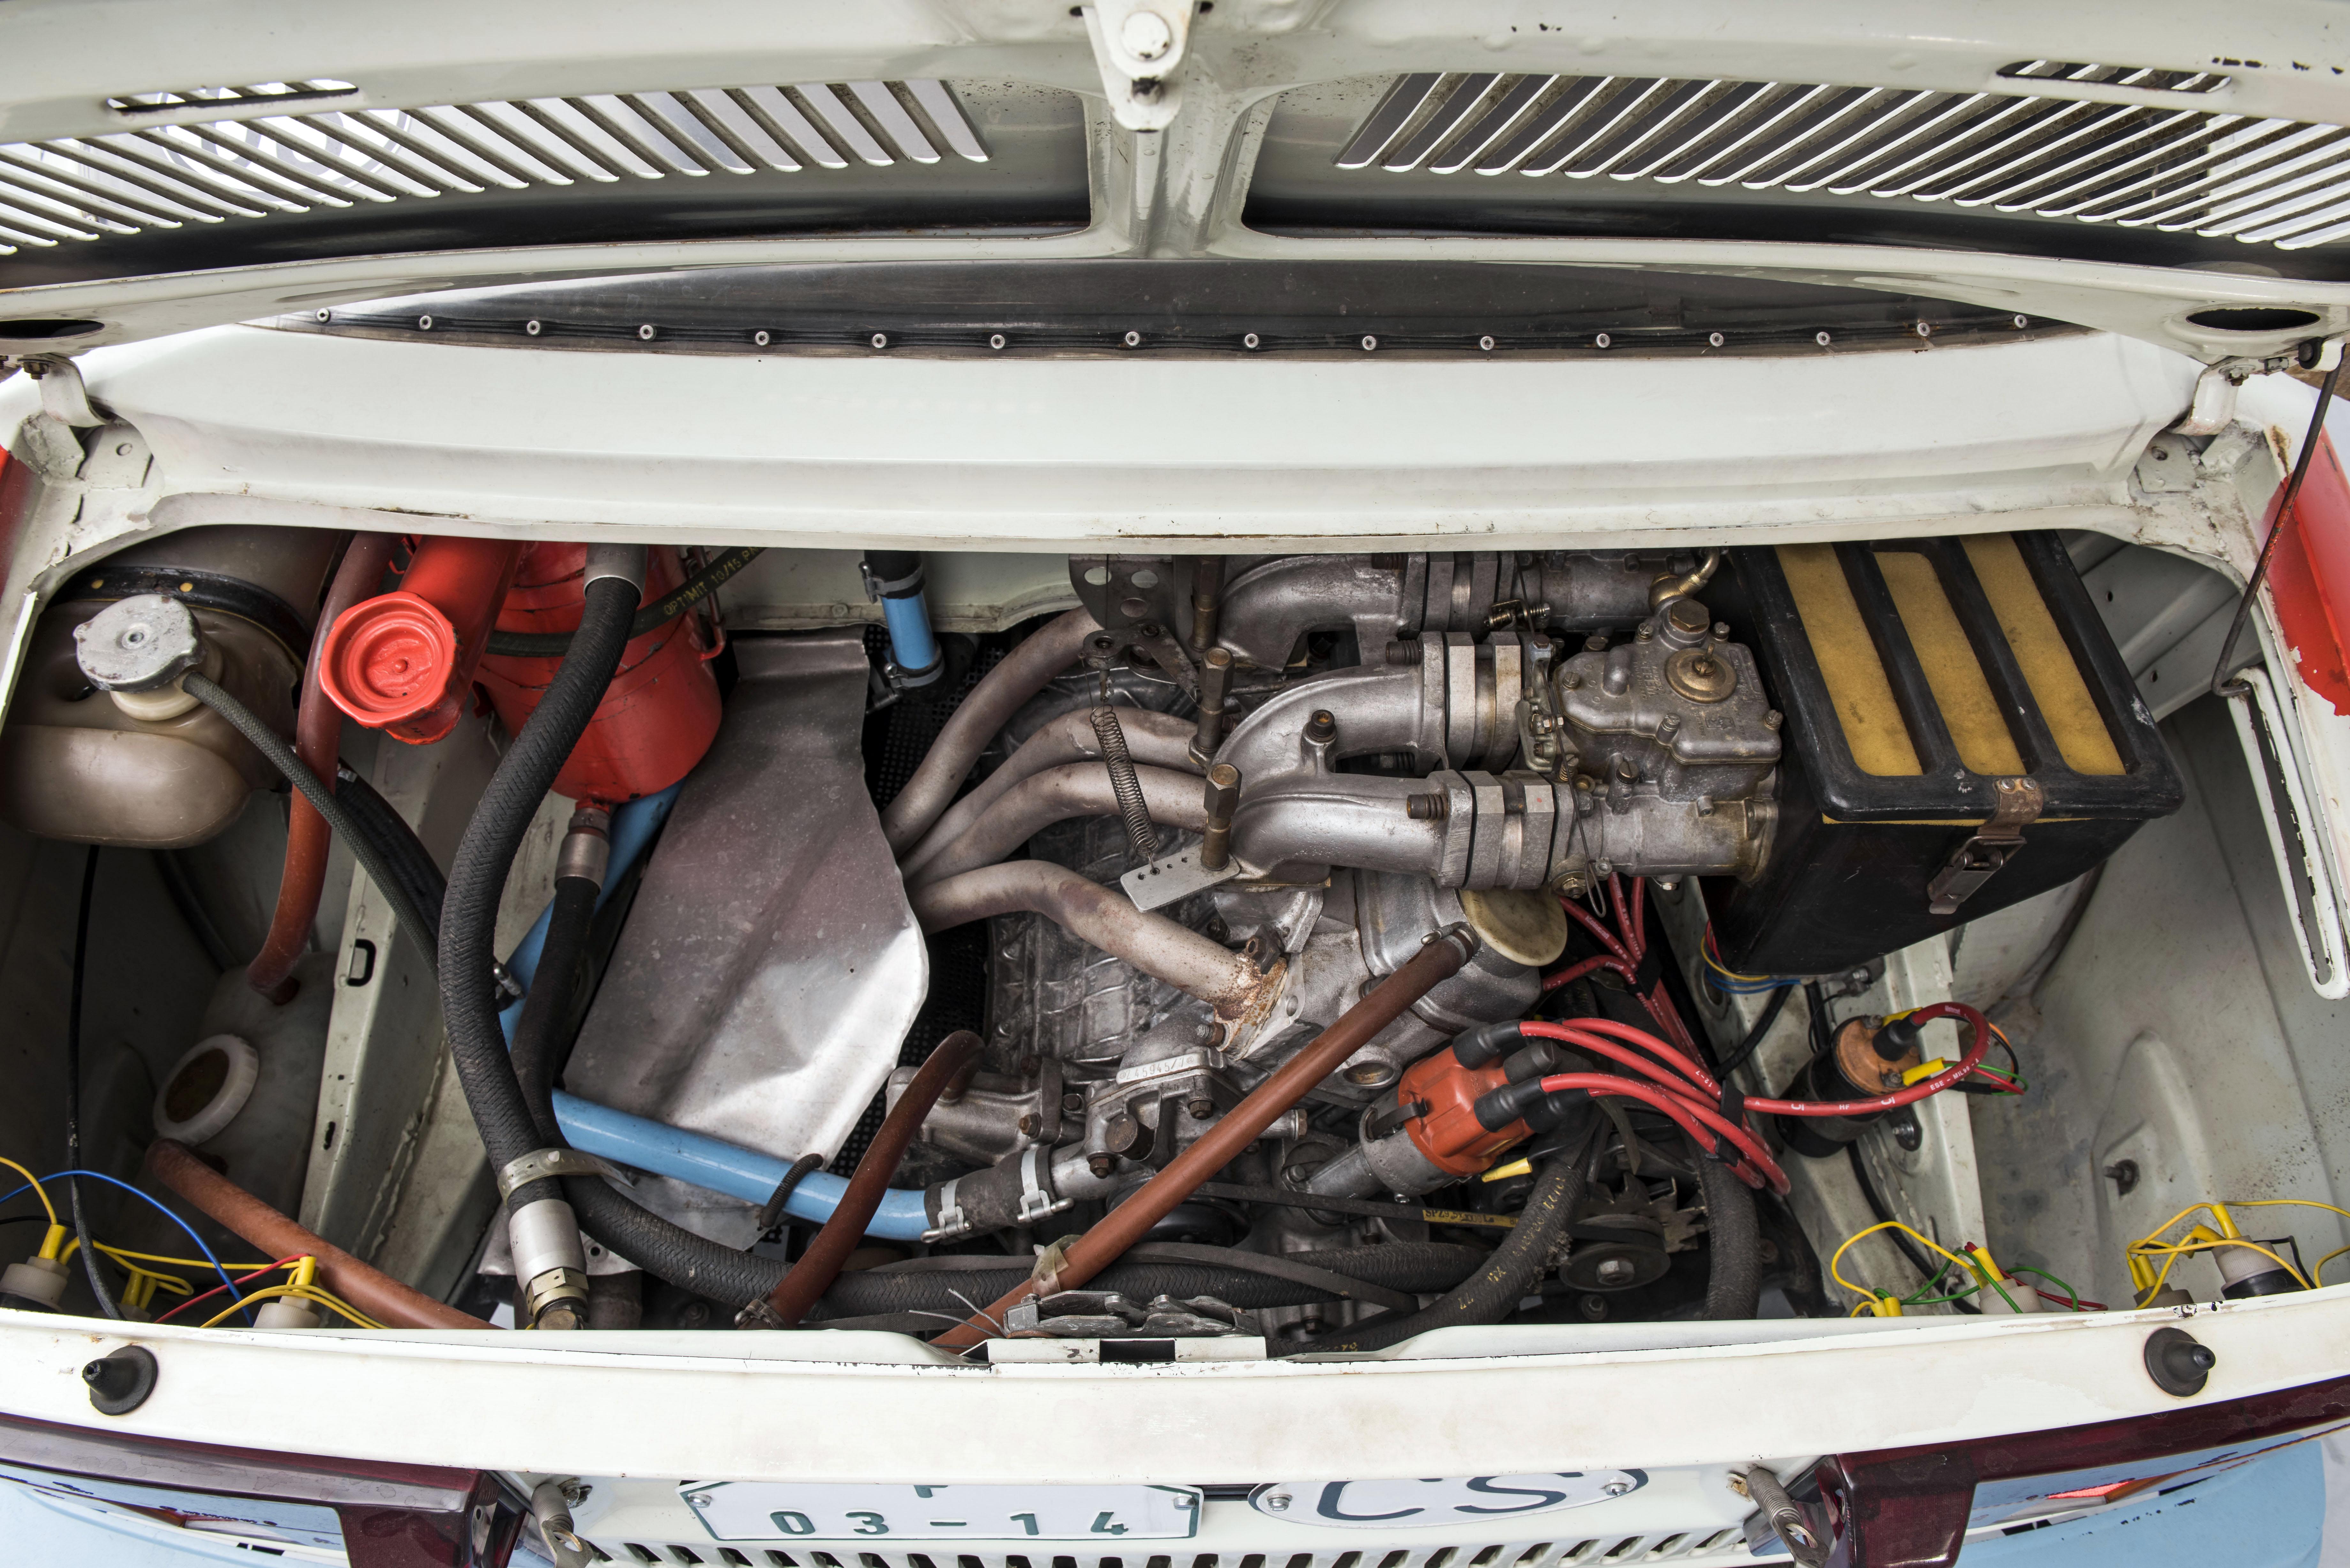 SKODA 130 LR (1984): Last motorsport model from Mladá Boleslav with rear-mounted engine - Image 2